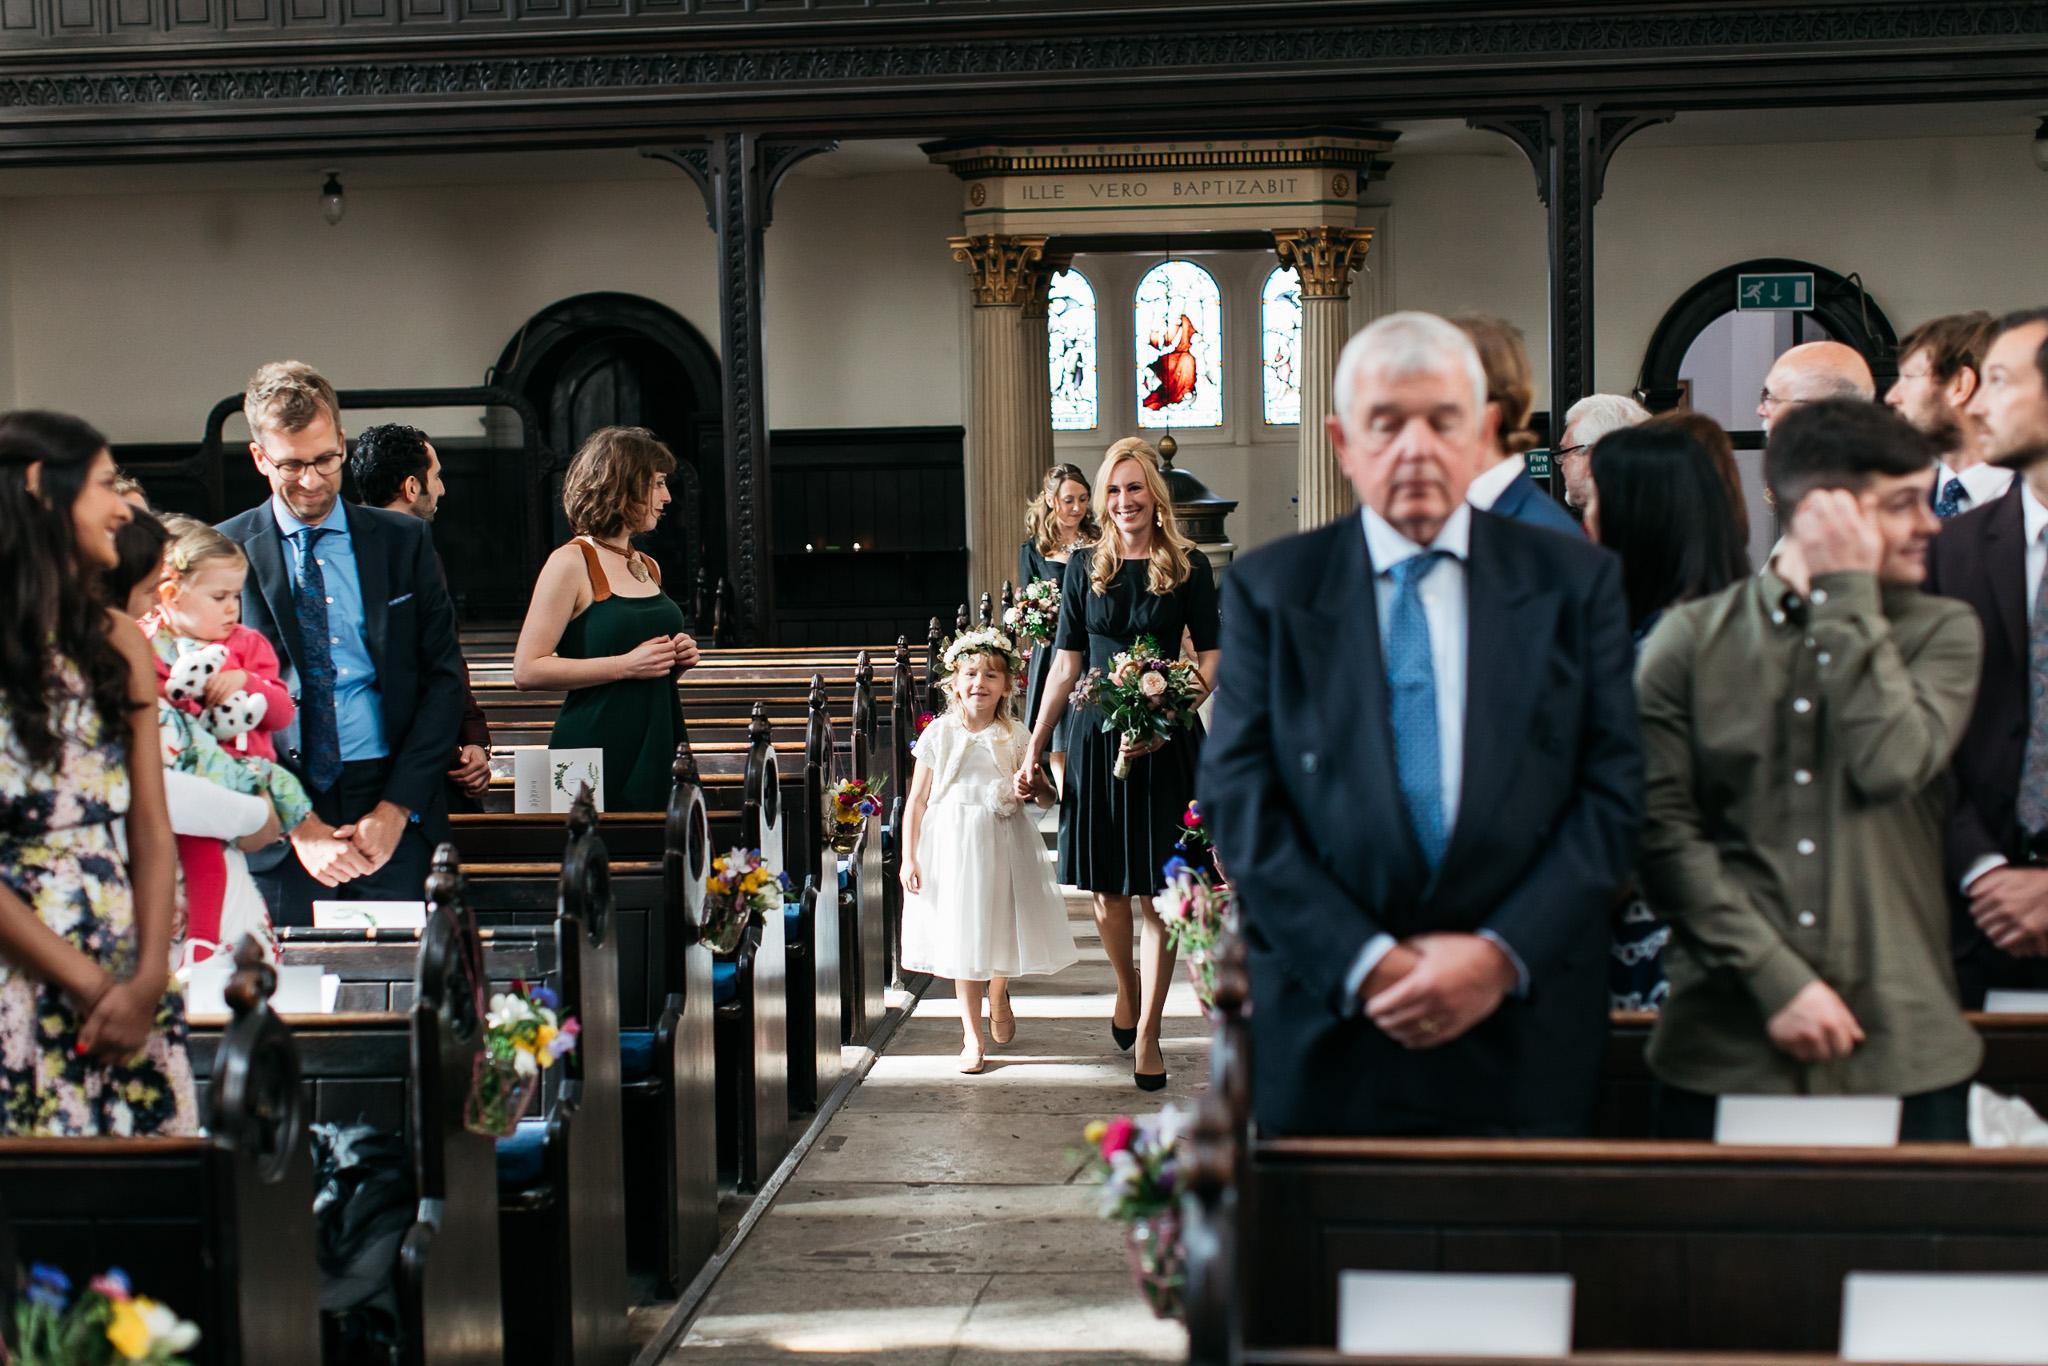 st_andrews_fabrica_brighton_wedding_548.jpg